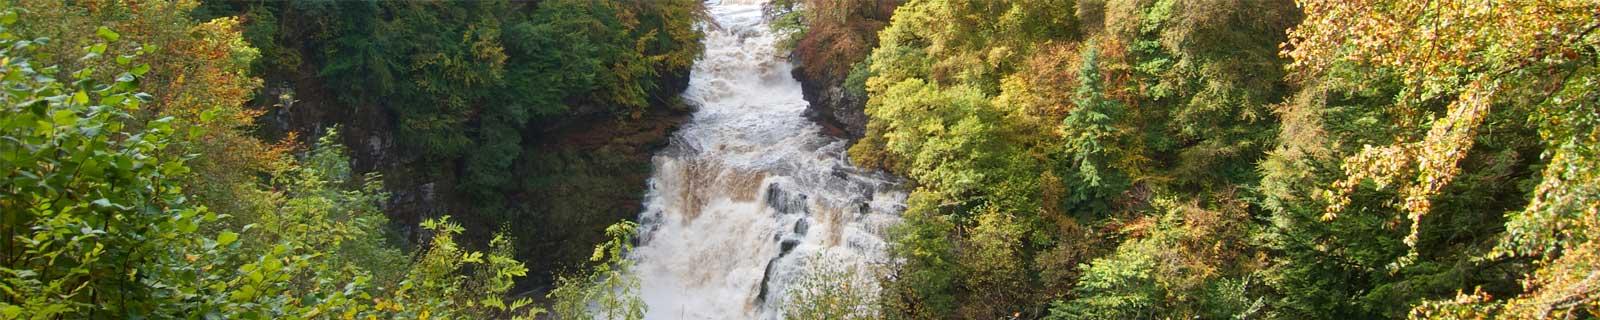 Lanark Solicitors - Hilland McNulty Solicitors Website Header Image - Falls of Clyde